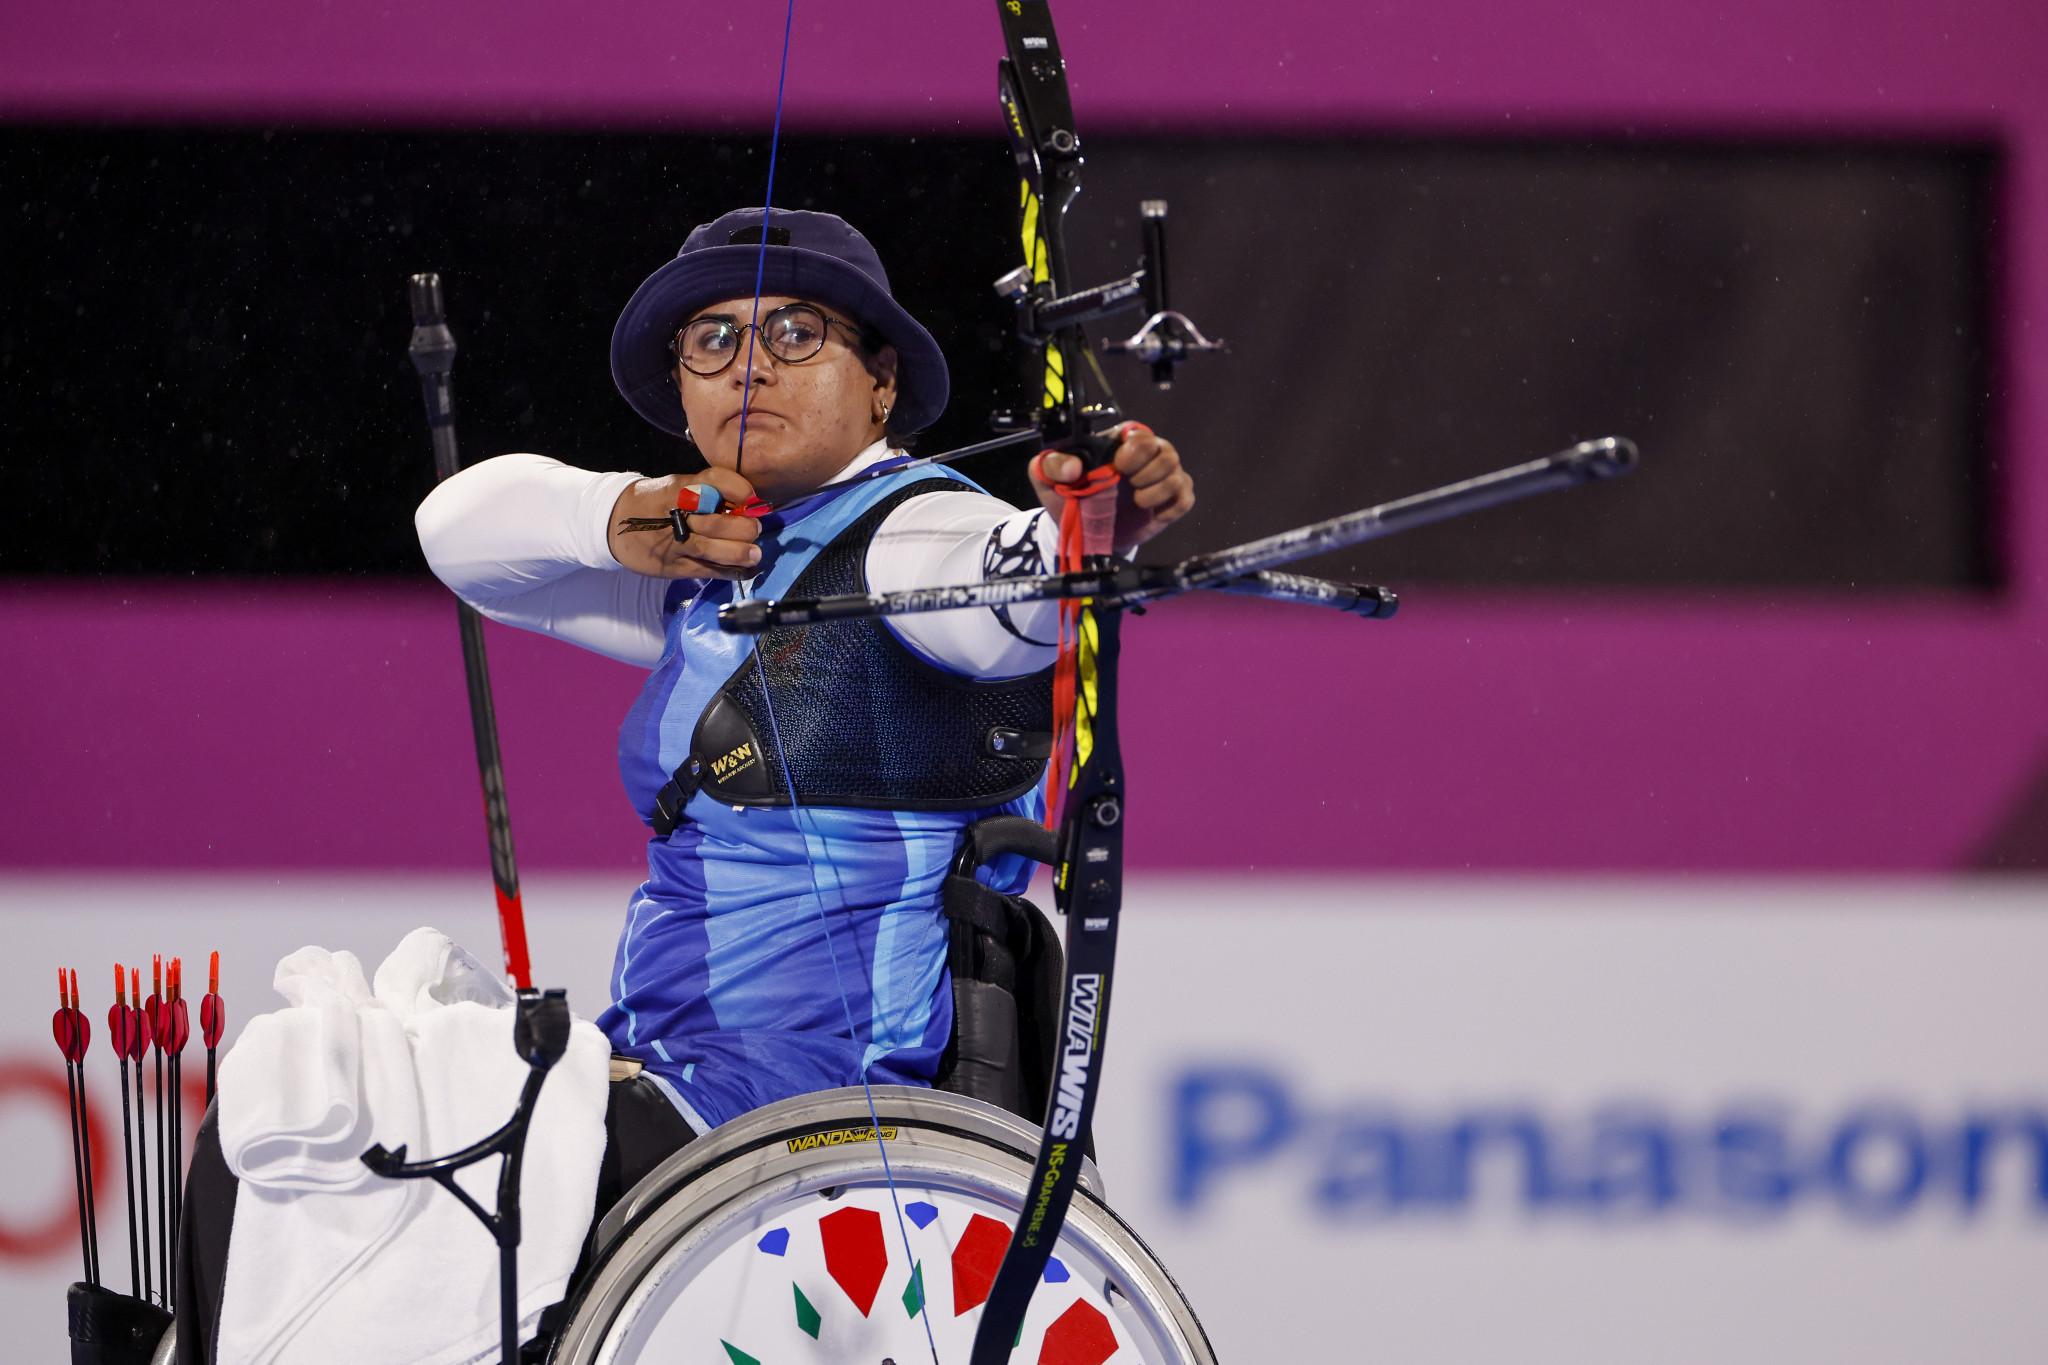 Para archery legend Nemati among those present as Iran celebrates National Paralympic Day